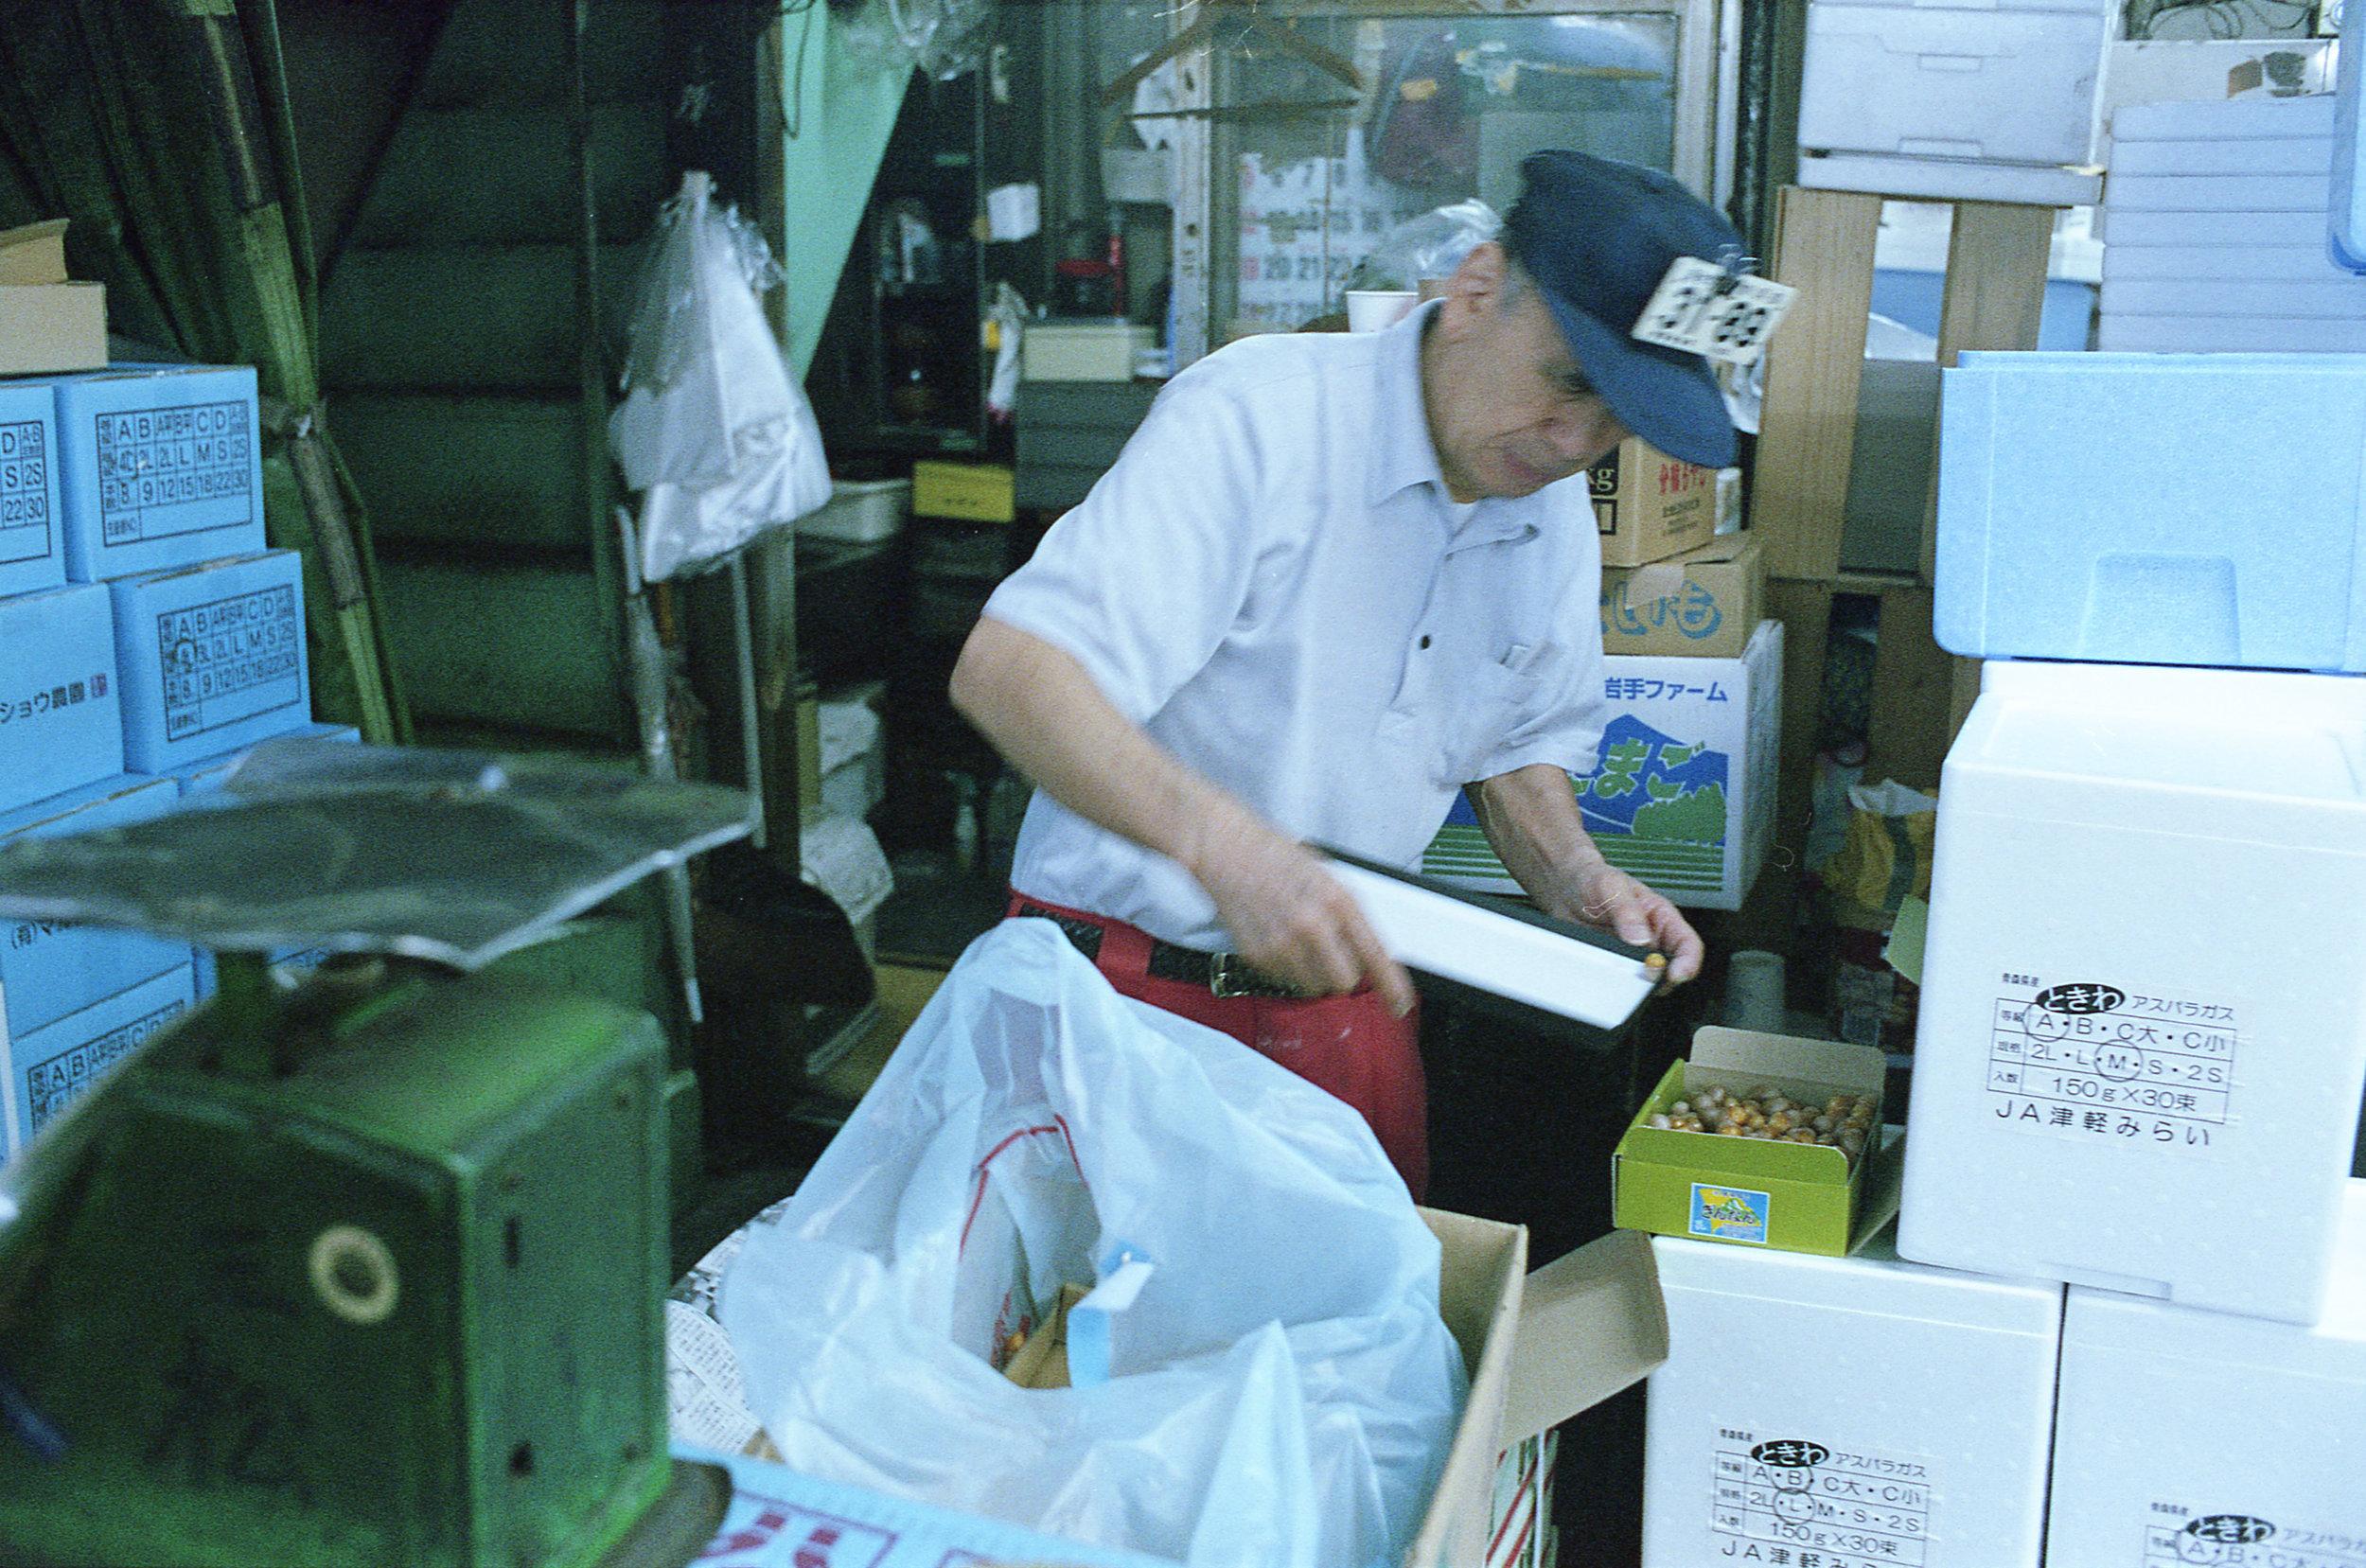 20180830_TsukijiMarket_025.jpg